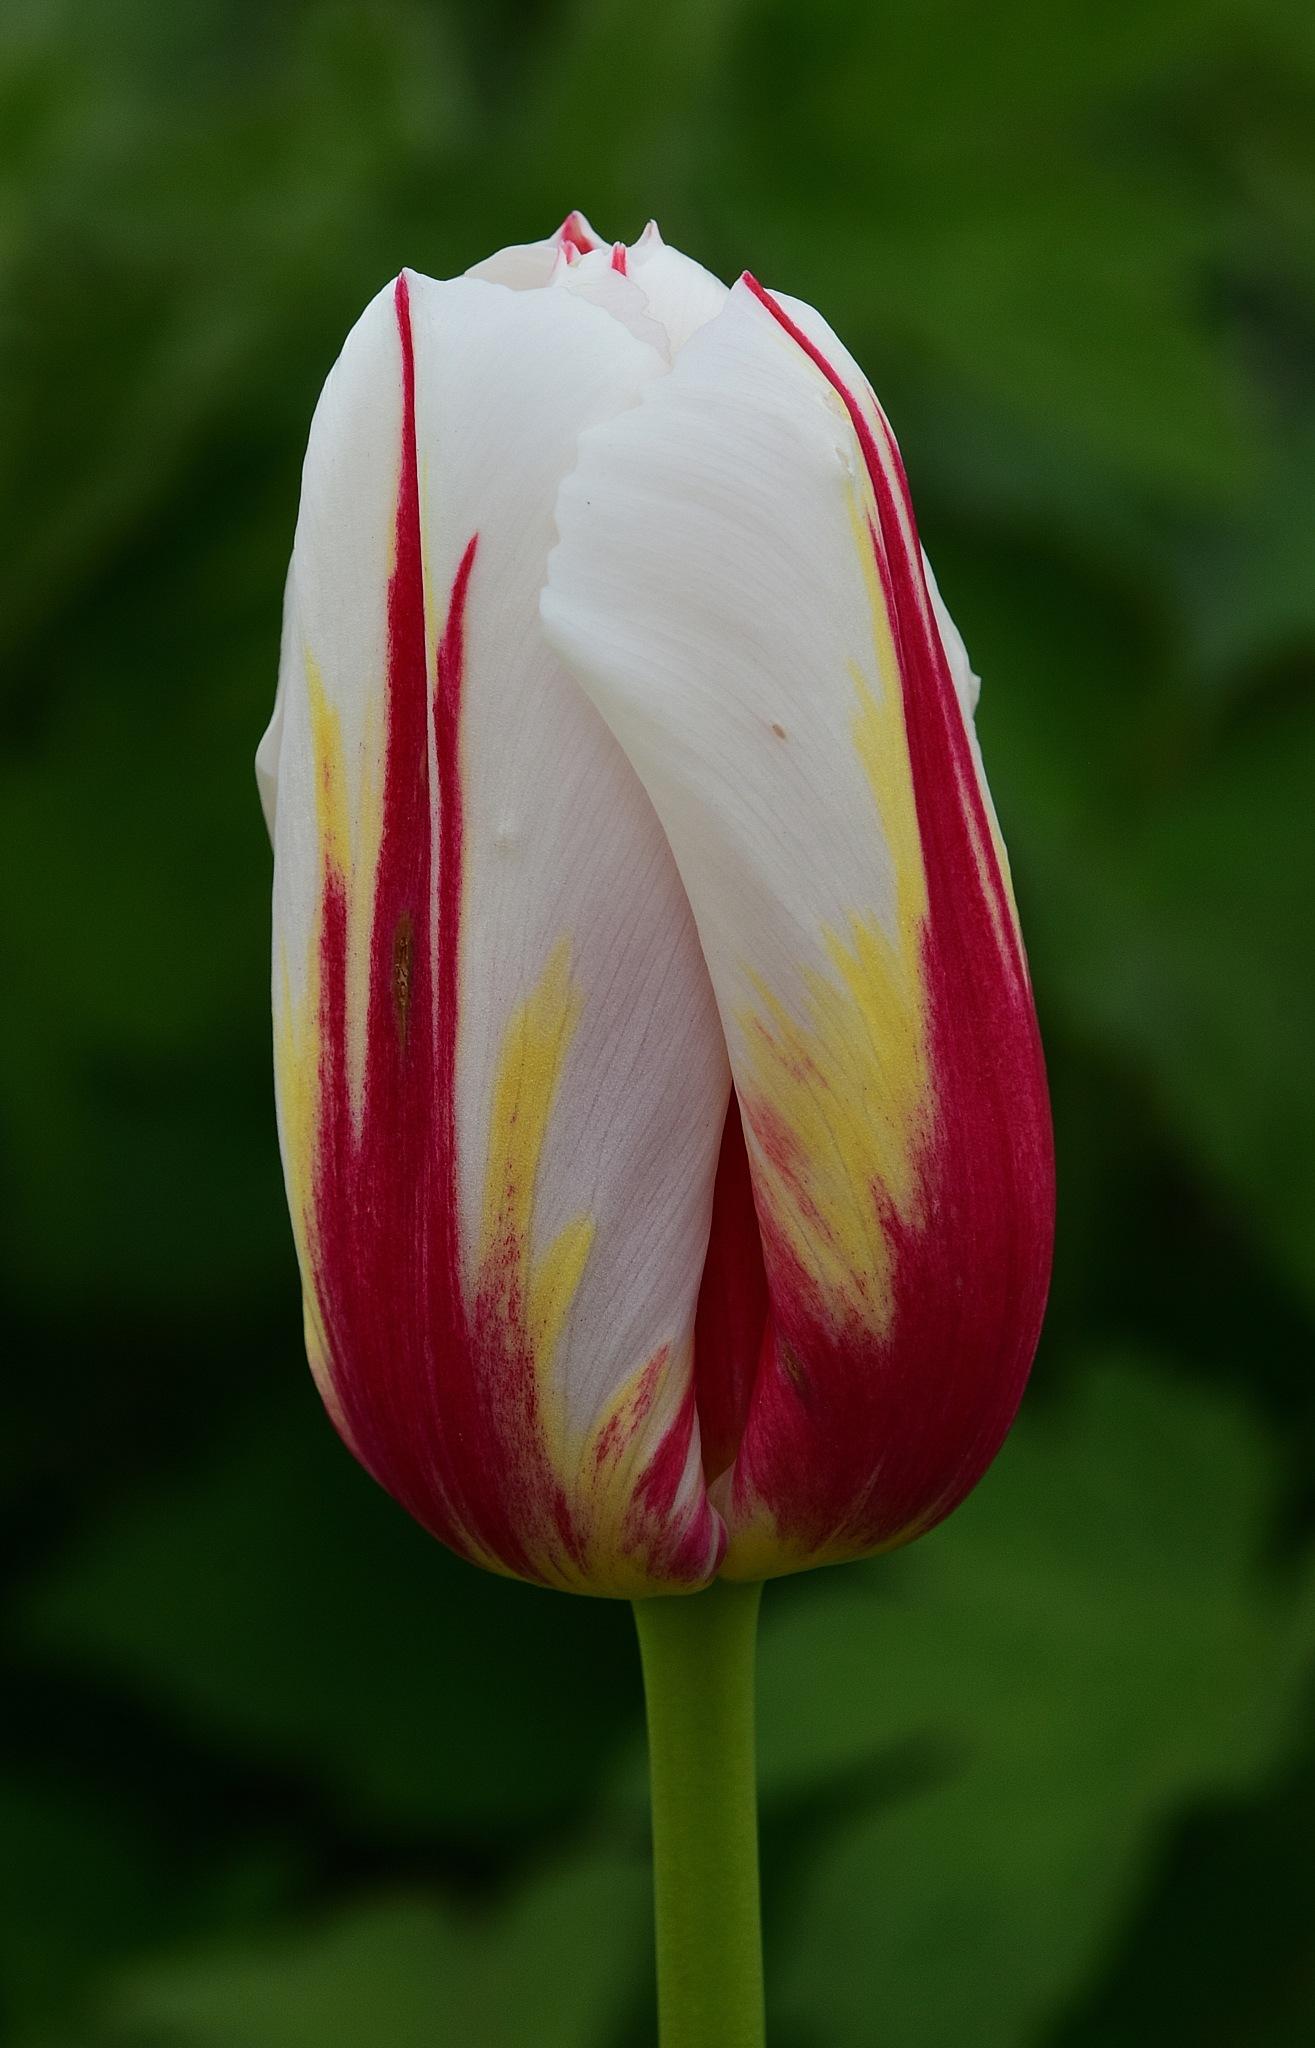 Canadian 150 Tulip by NaumanMughal